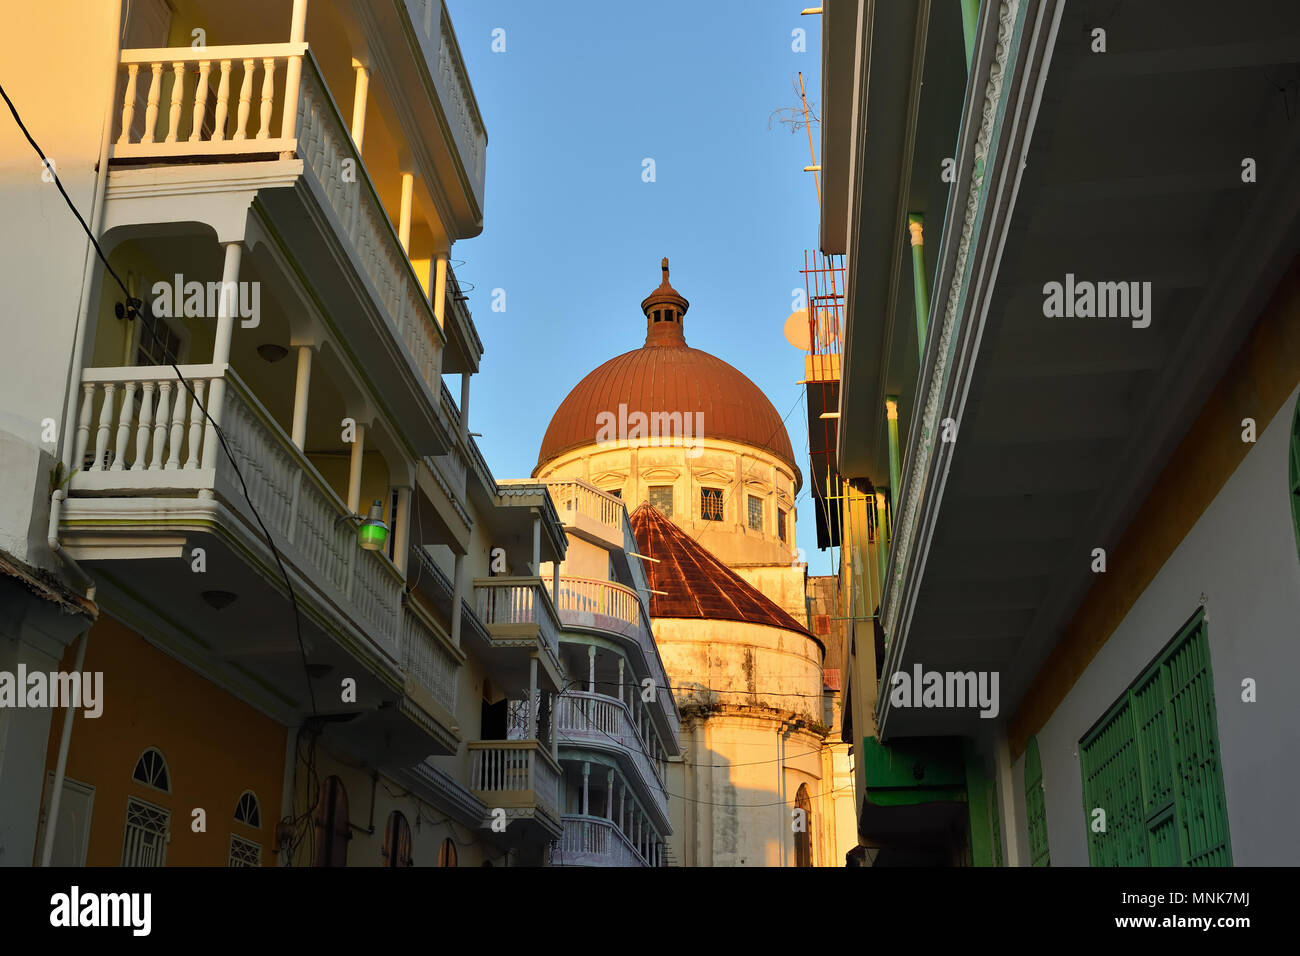 Blick auf den Dom mit dem Domplatz im Cap Haitien Stadt in Haiti Stockbild